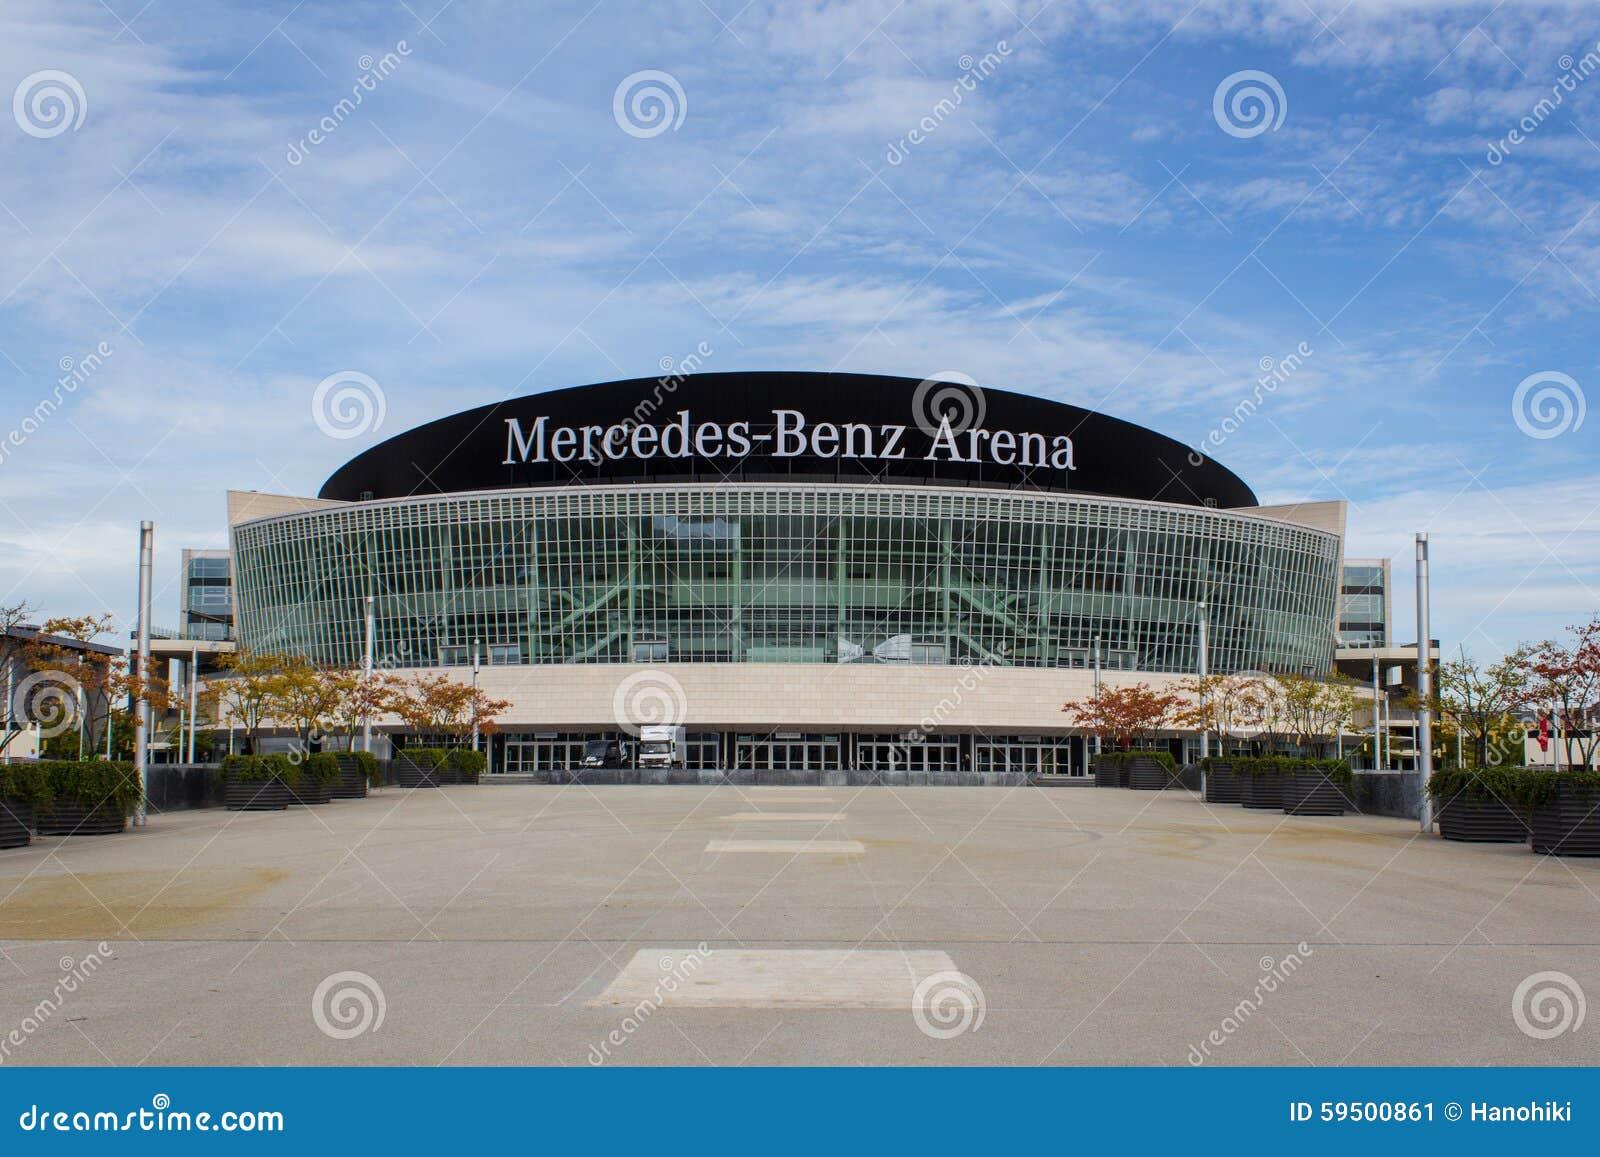 Berlin, am 16. September 2015: Die Mercedes Benz Arena-Fassade in Berlin, Deutschland Mercedes Benz Arena (formal: Die O2 Welt AR